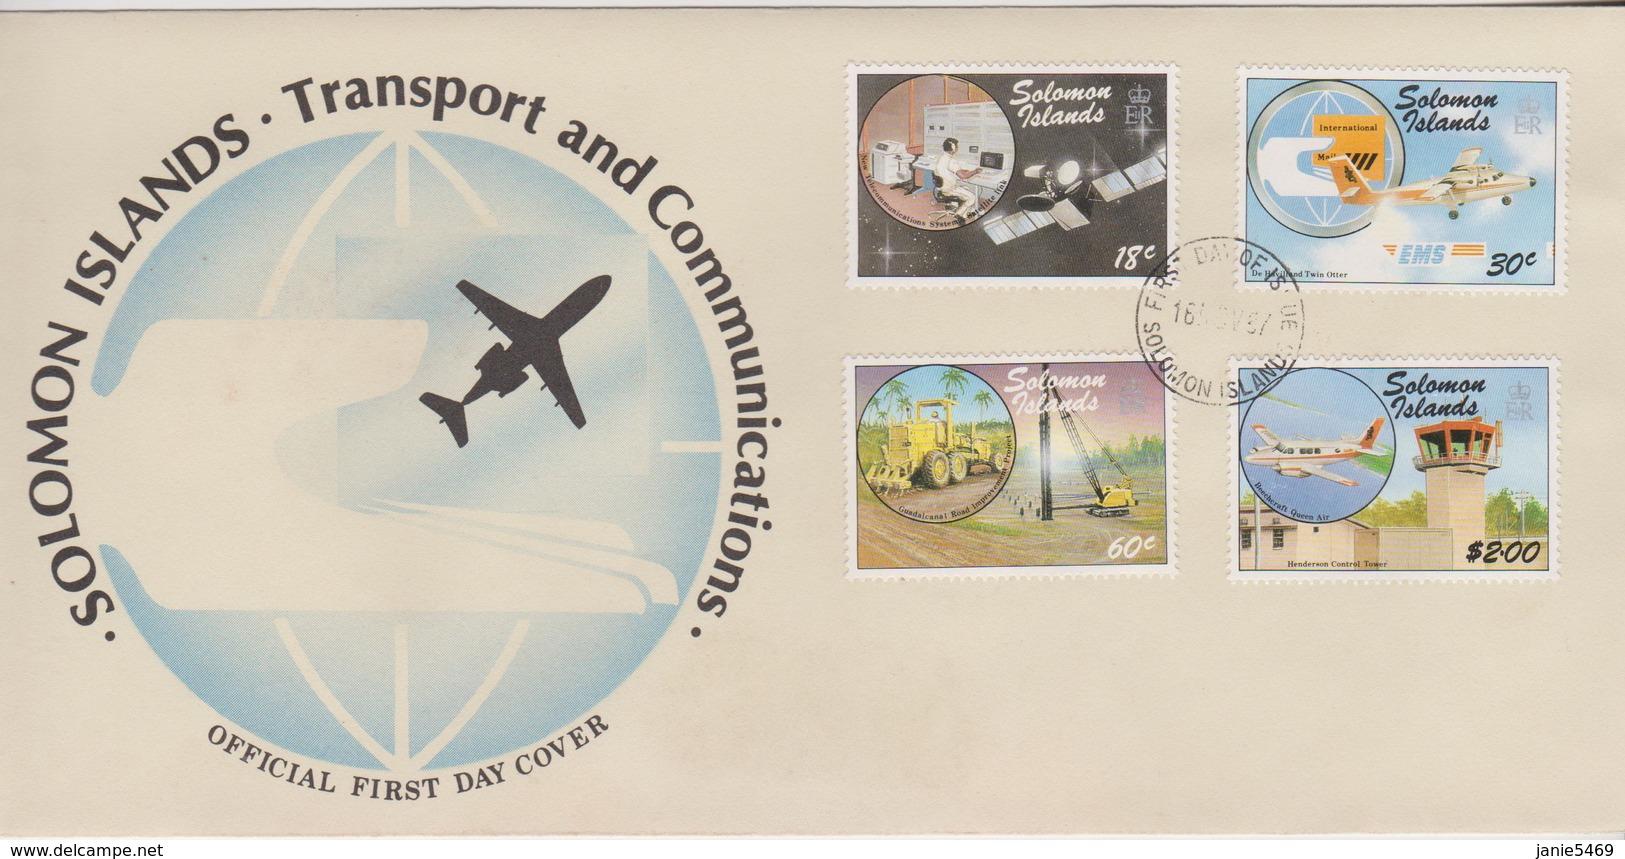 Solomon Islands 1987 Transport And Communications,FDC - Solomon Islands (1978-...)